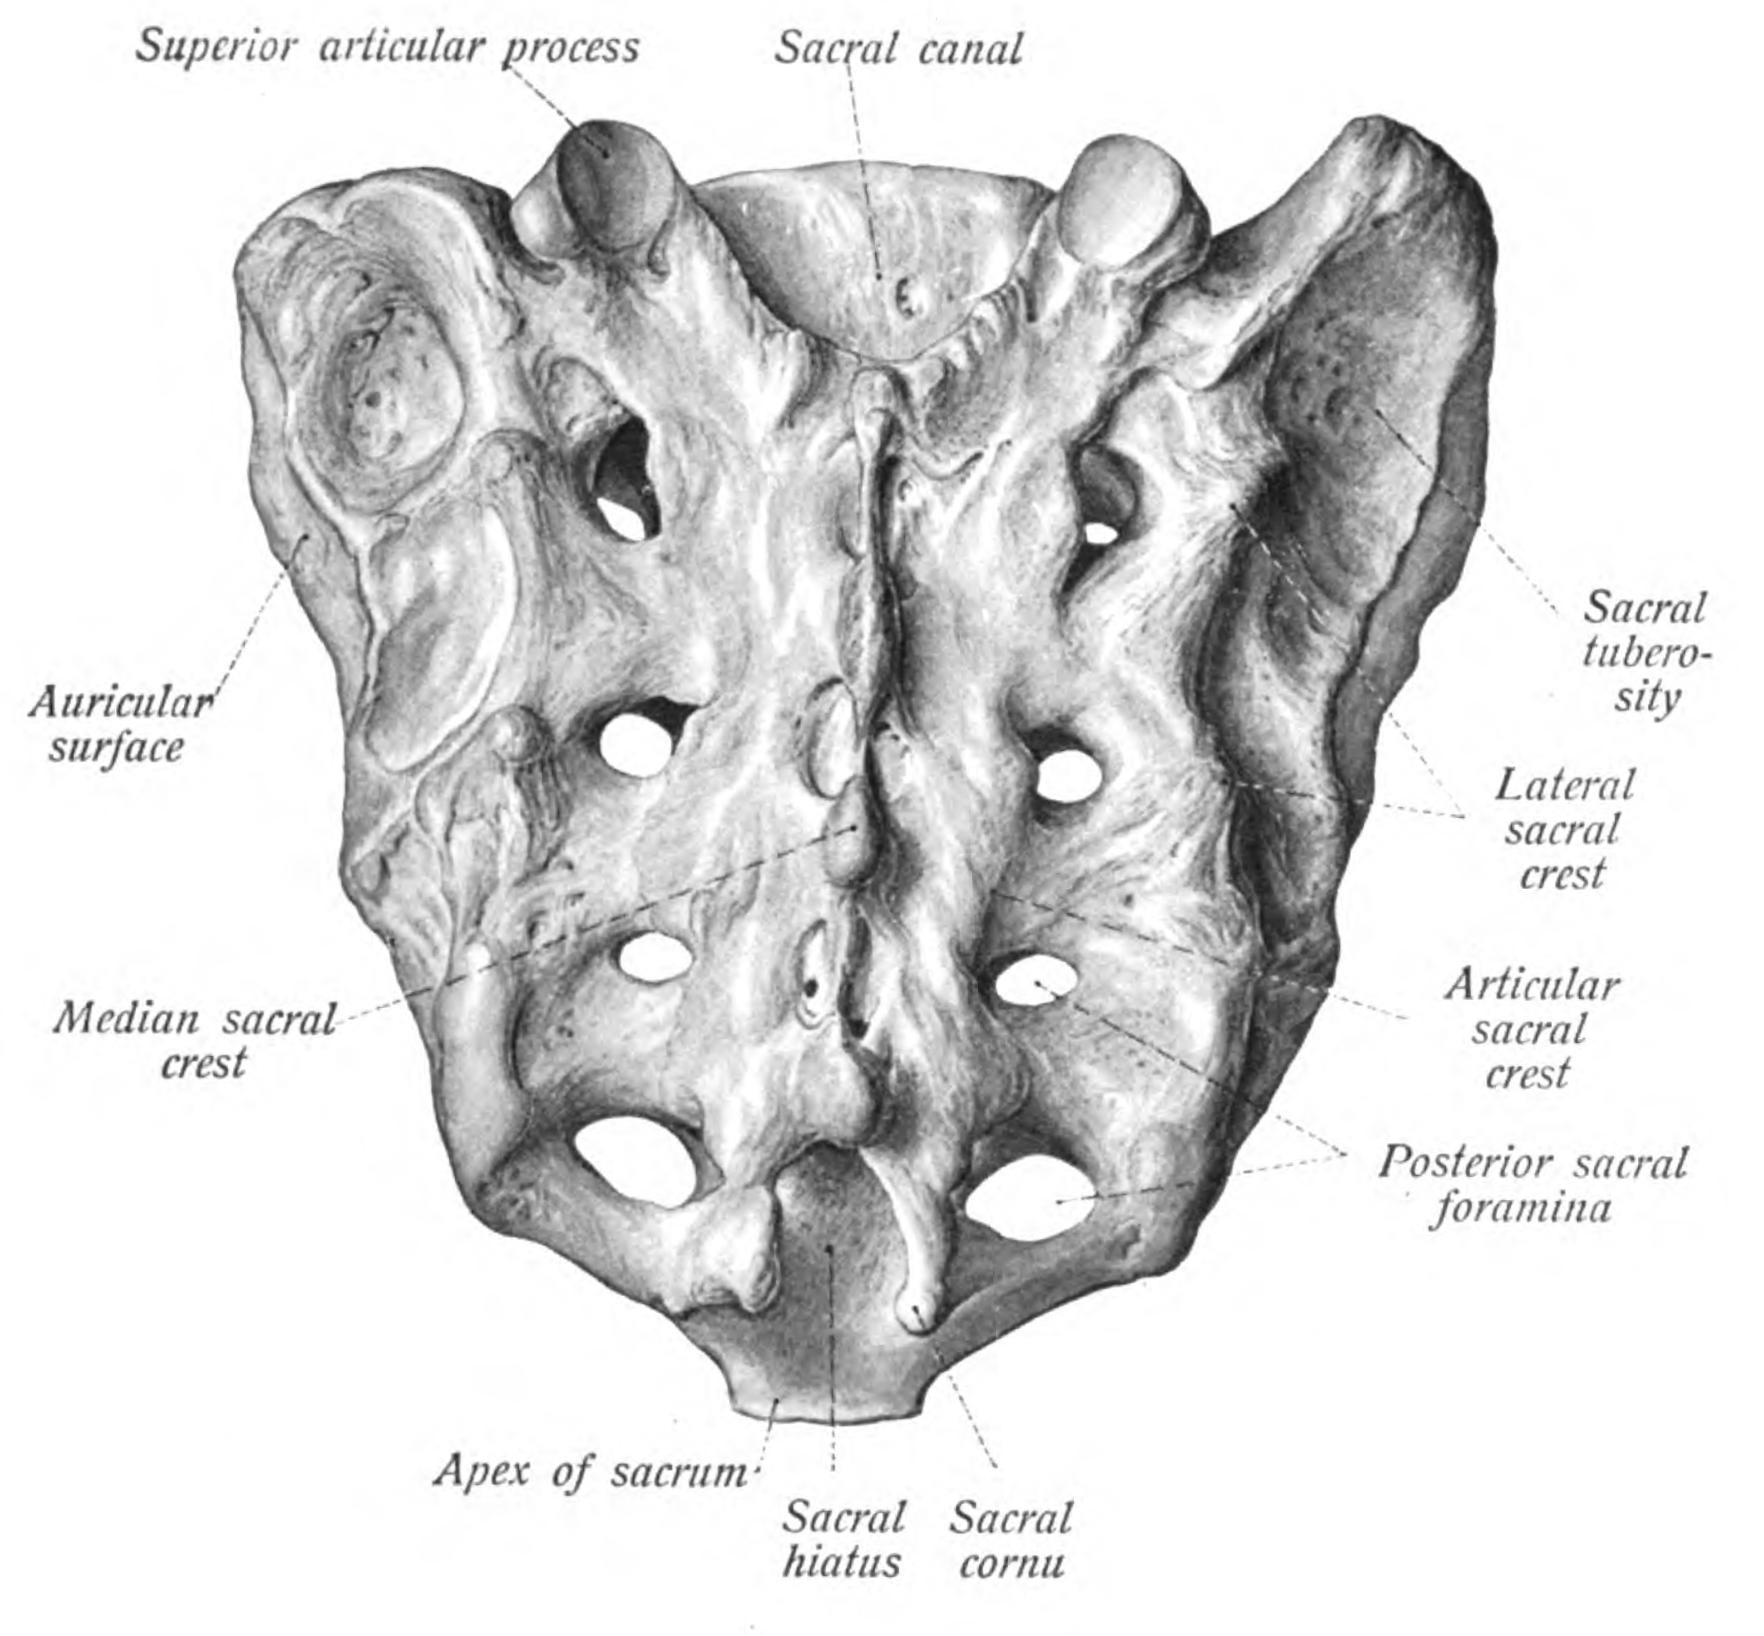 File:Sobo 1909 13.png - Wikipedia